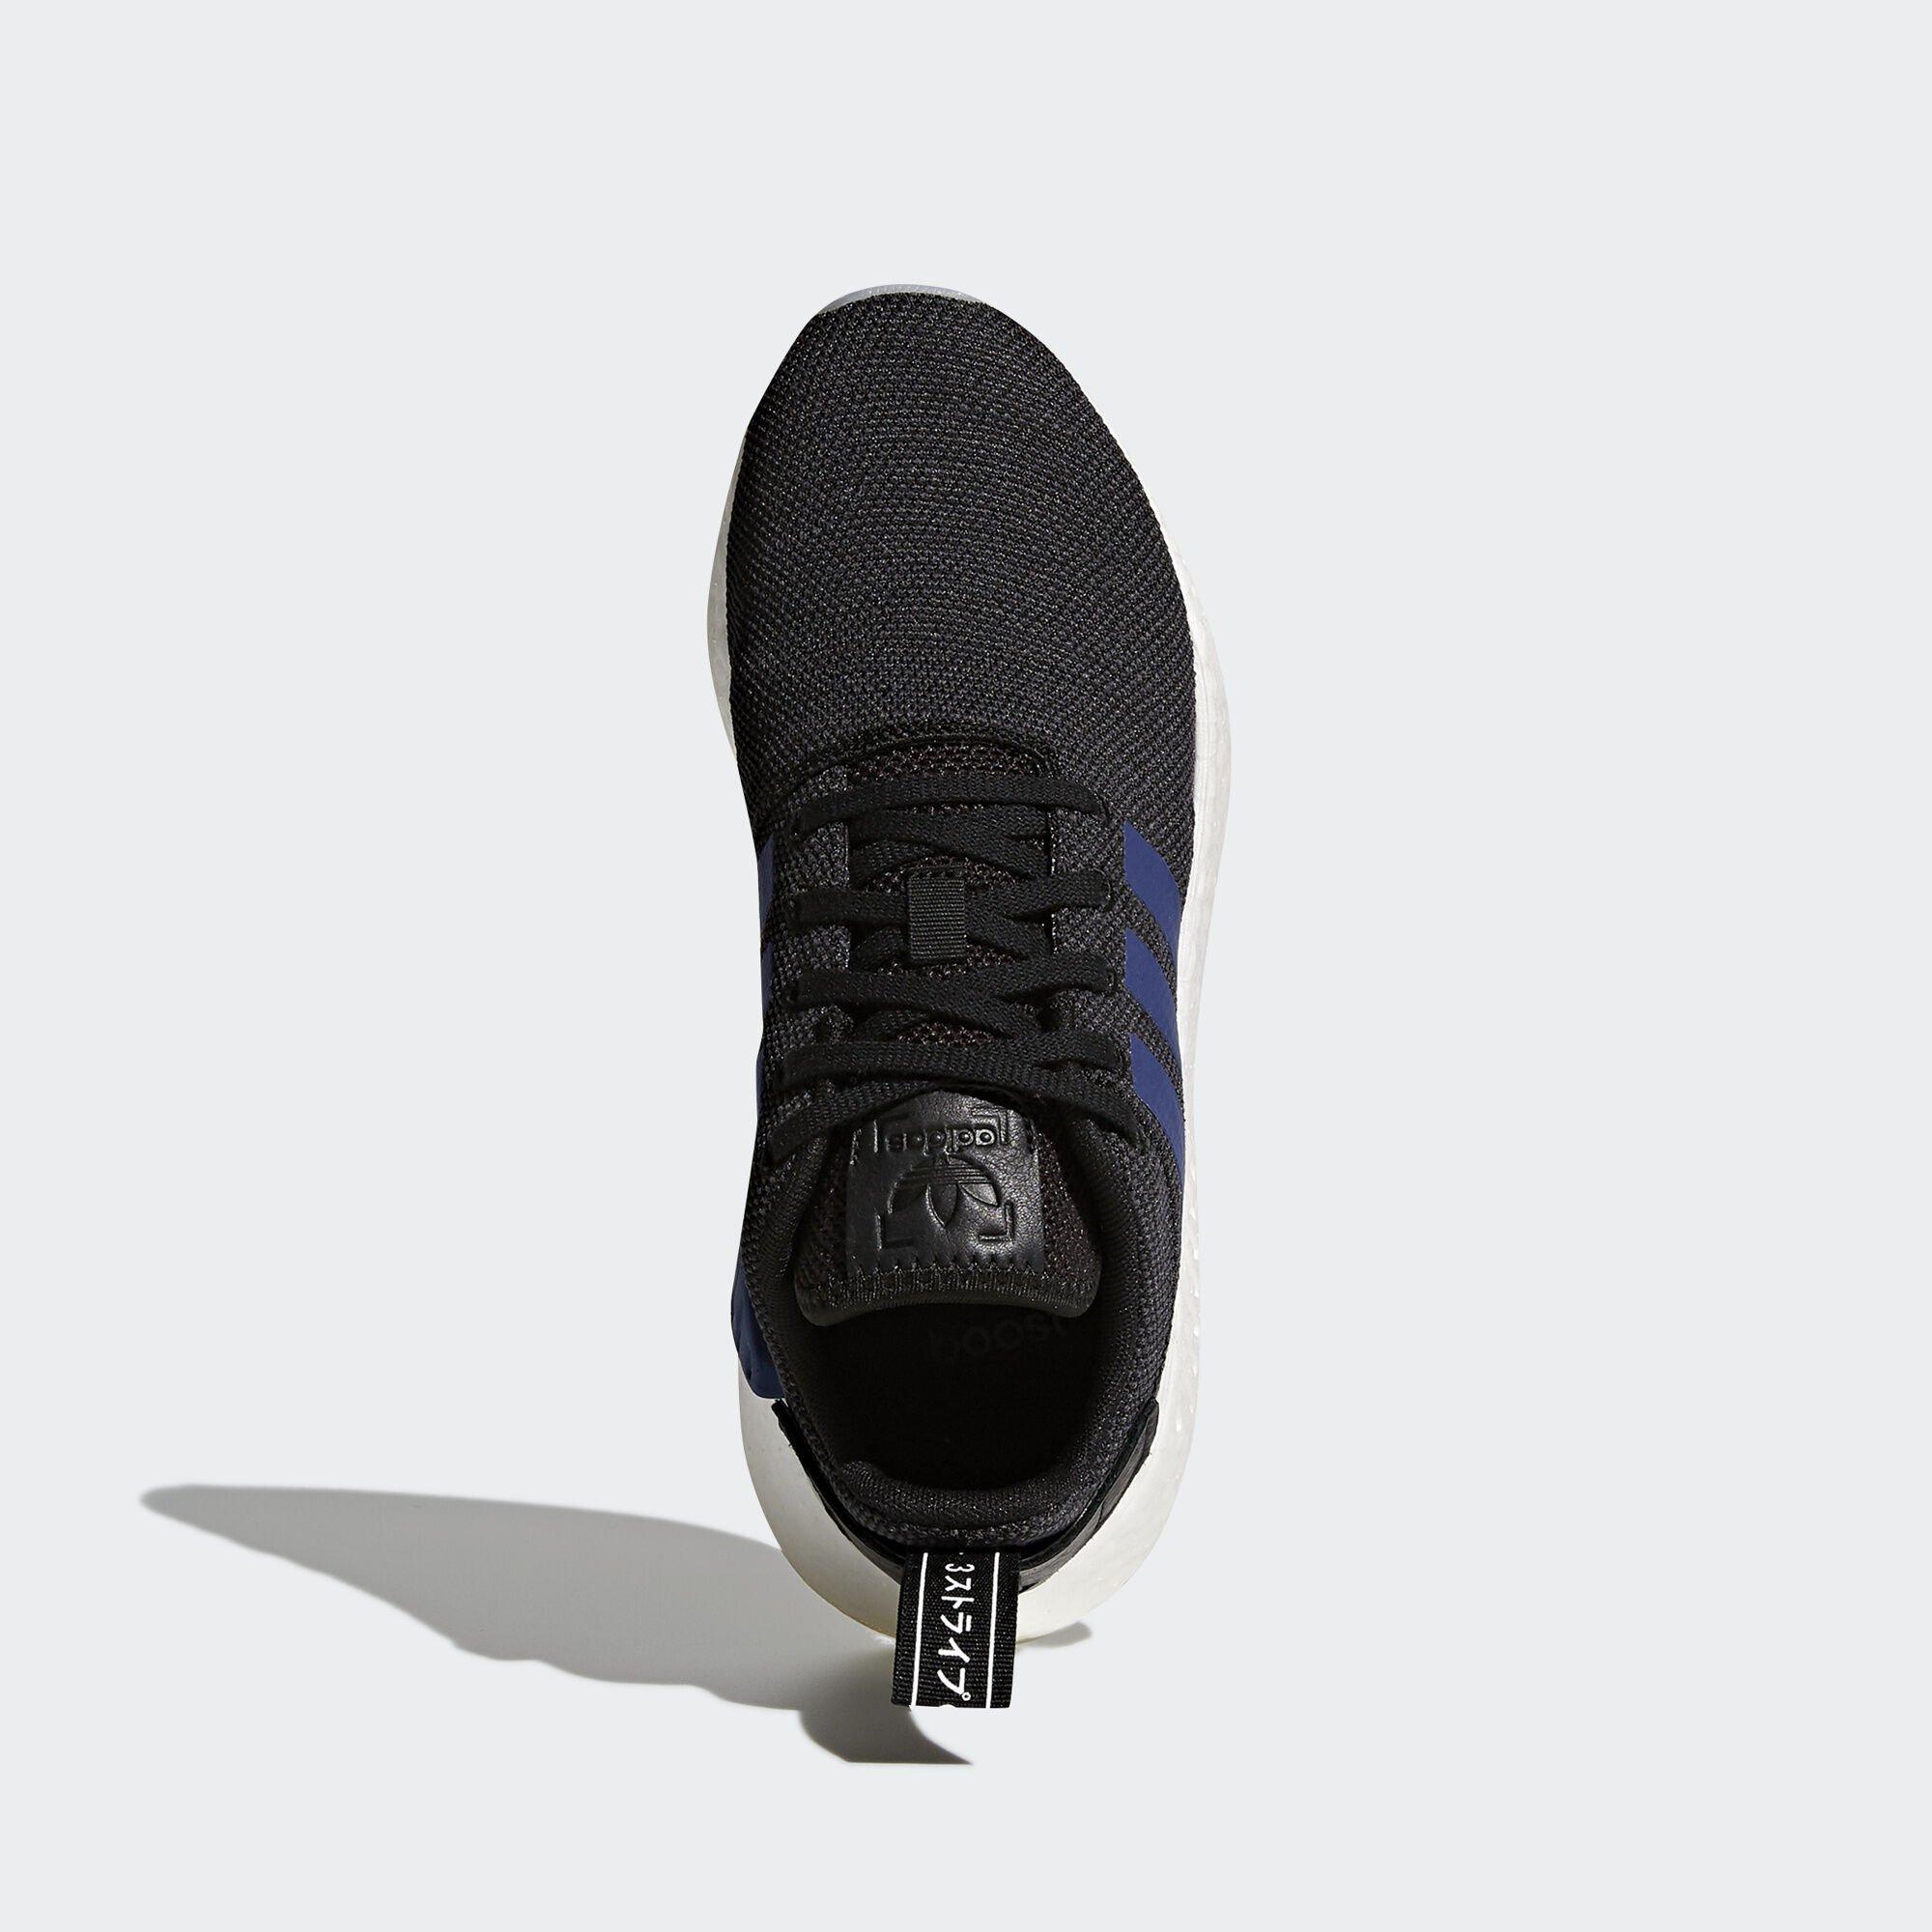 adidas NMD R2 Core Black Noble Indigo (W) (CQ2008)